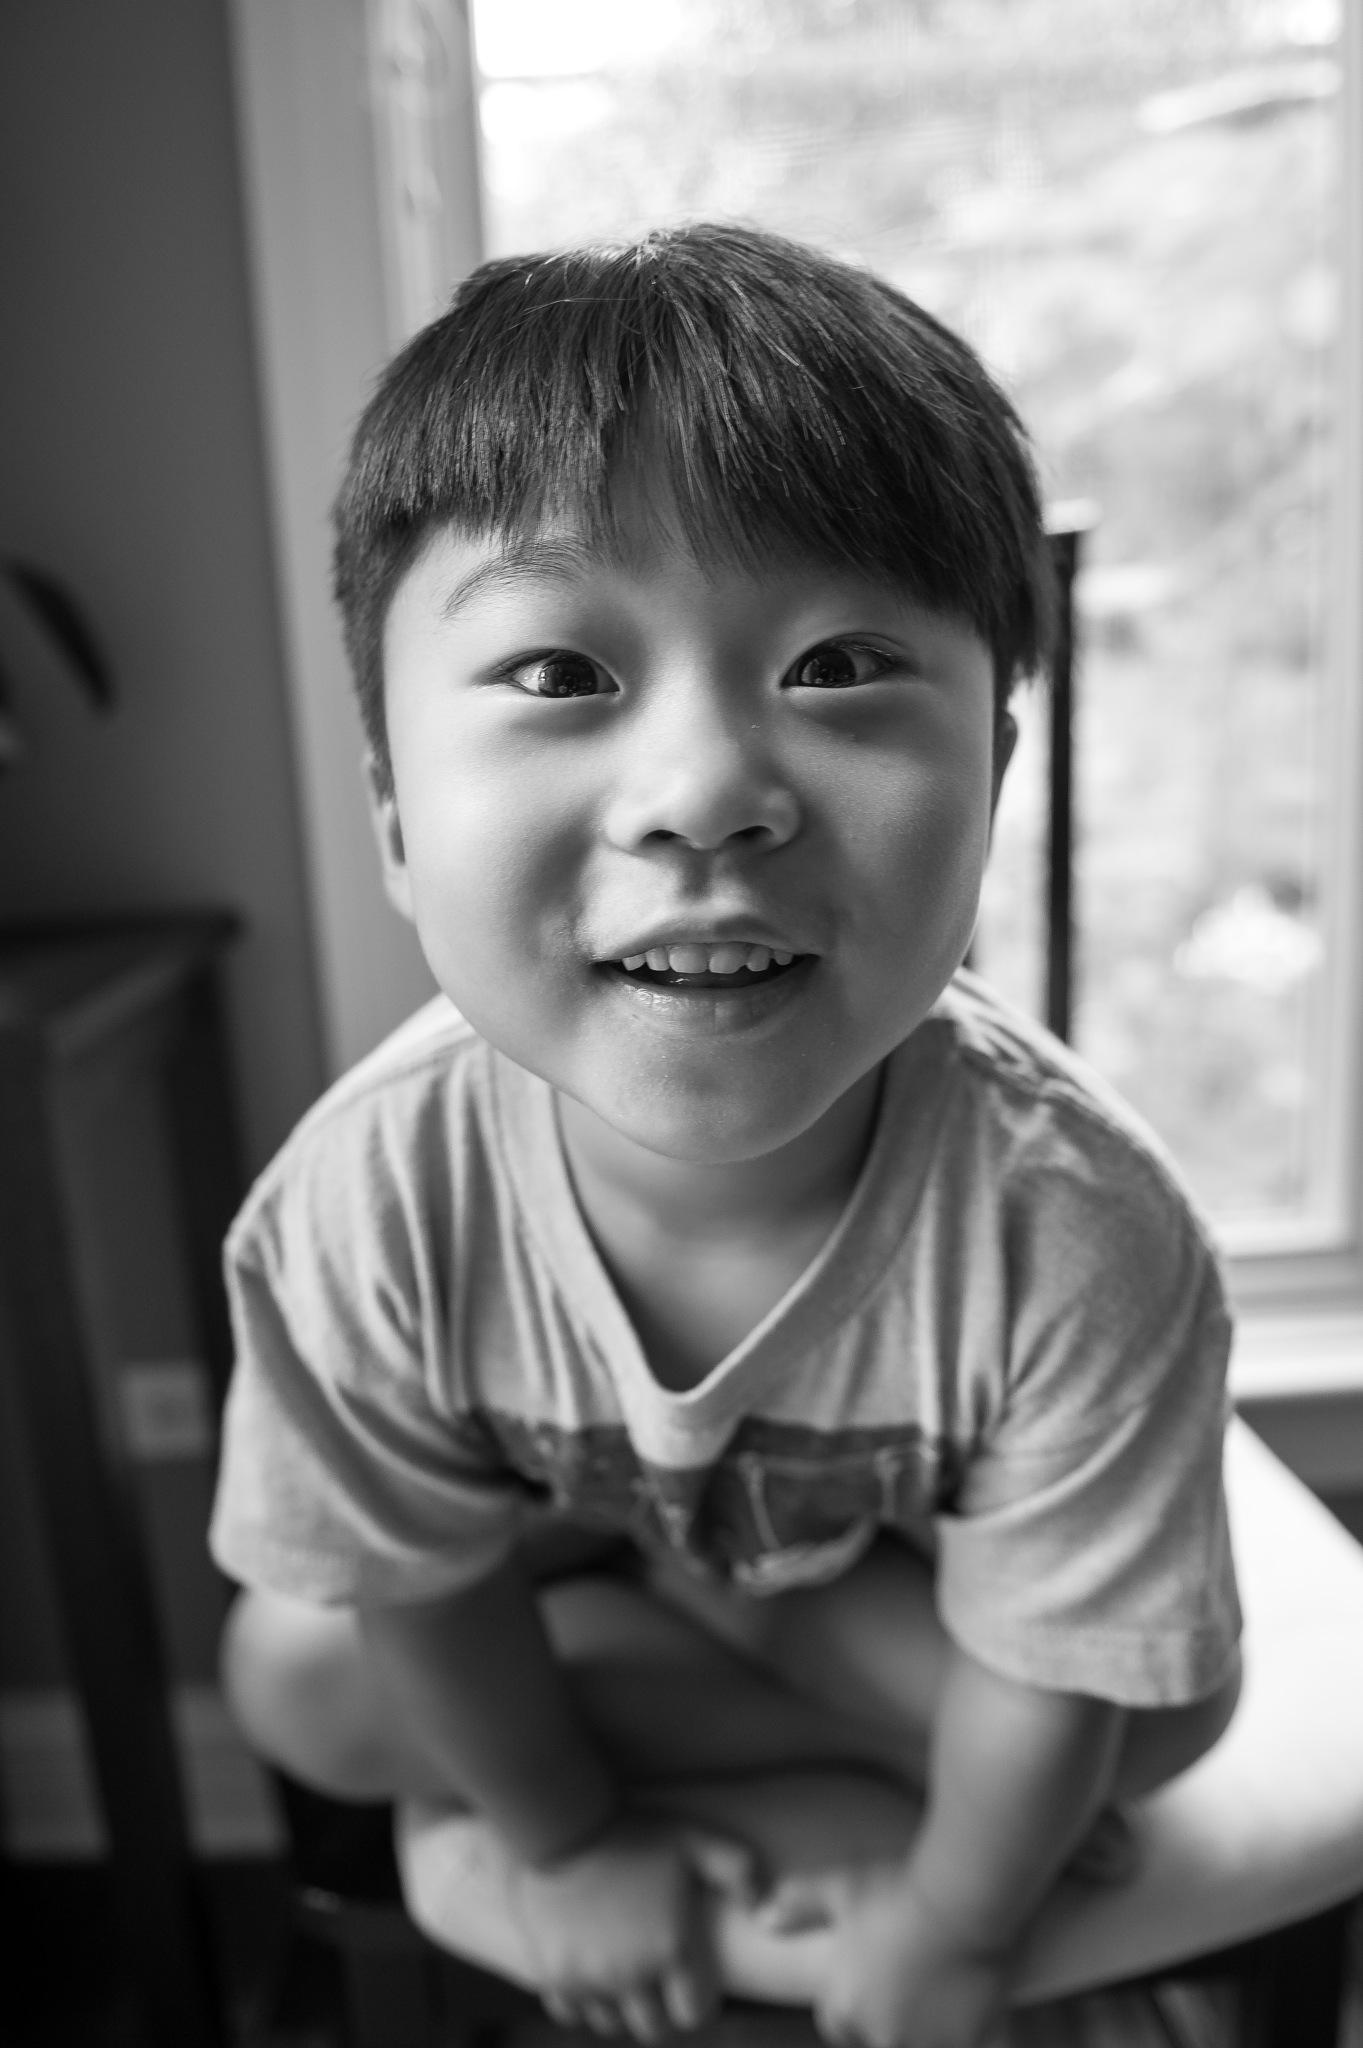 I see you! by Kai Kim